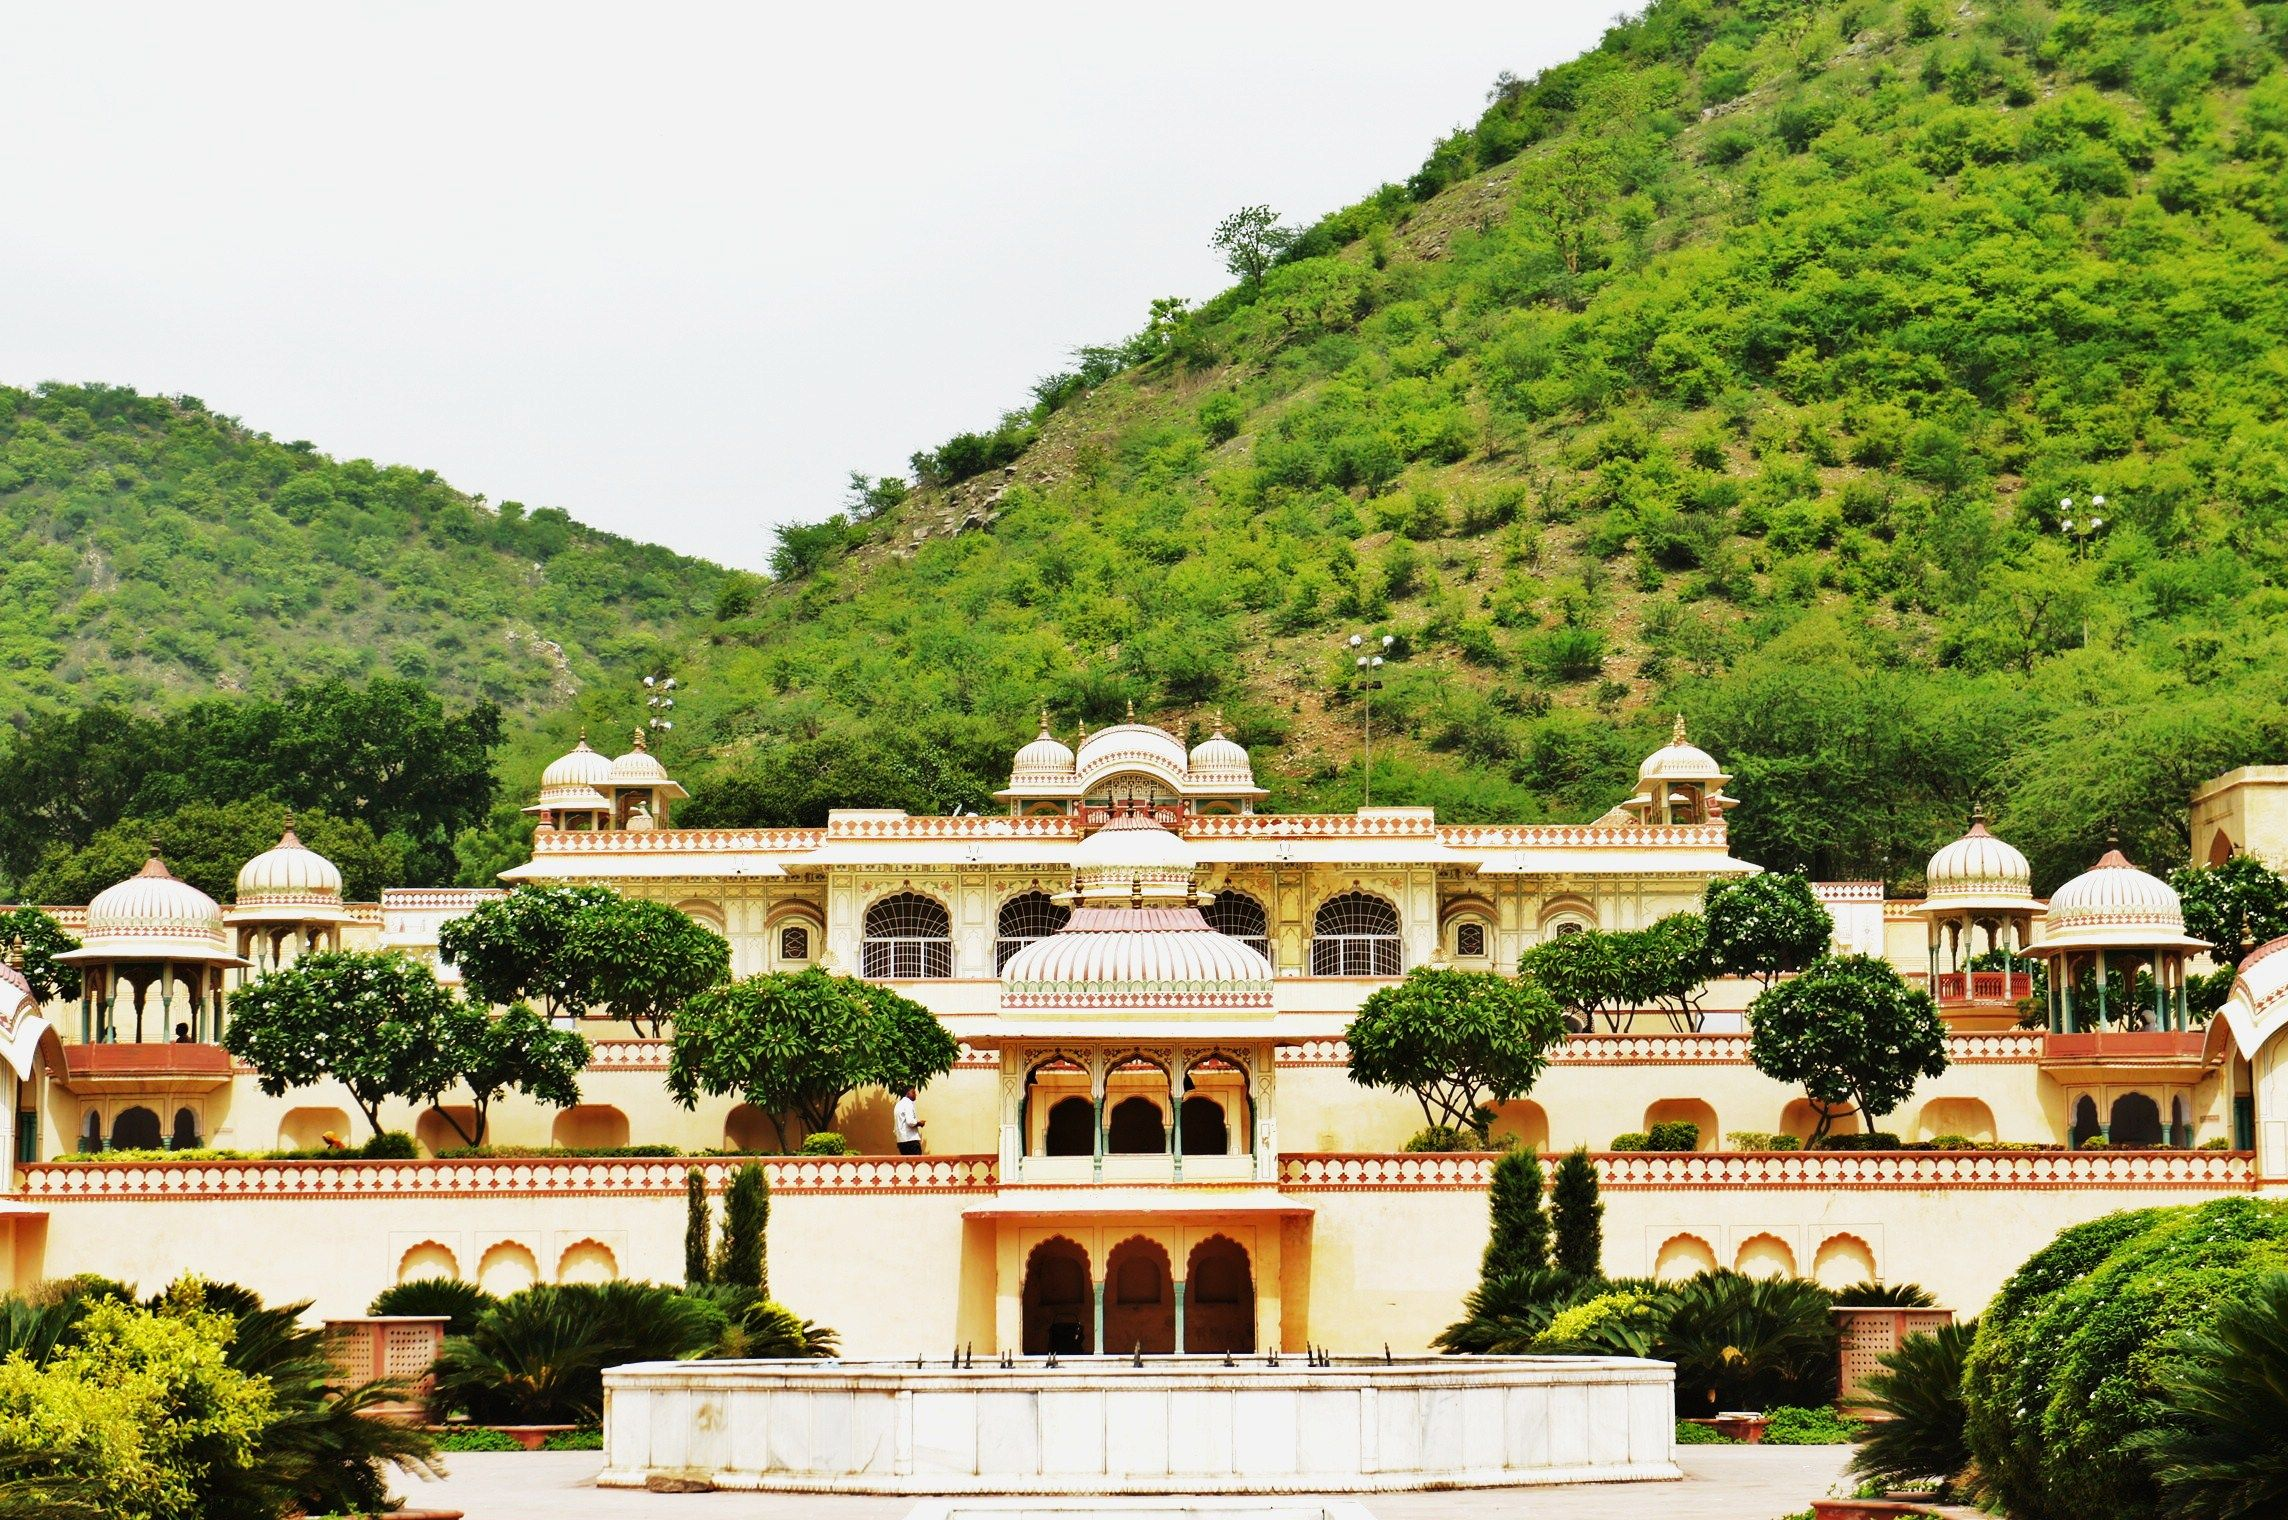 Sisodia Rani Garden And Palace Is A Palace Garden 6 Kilometres